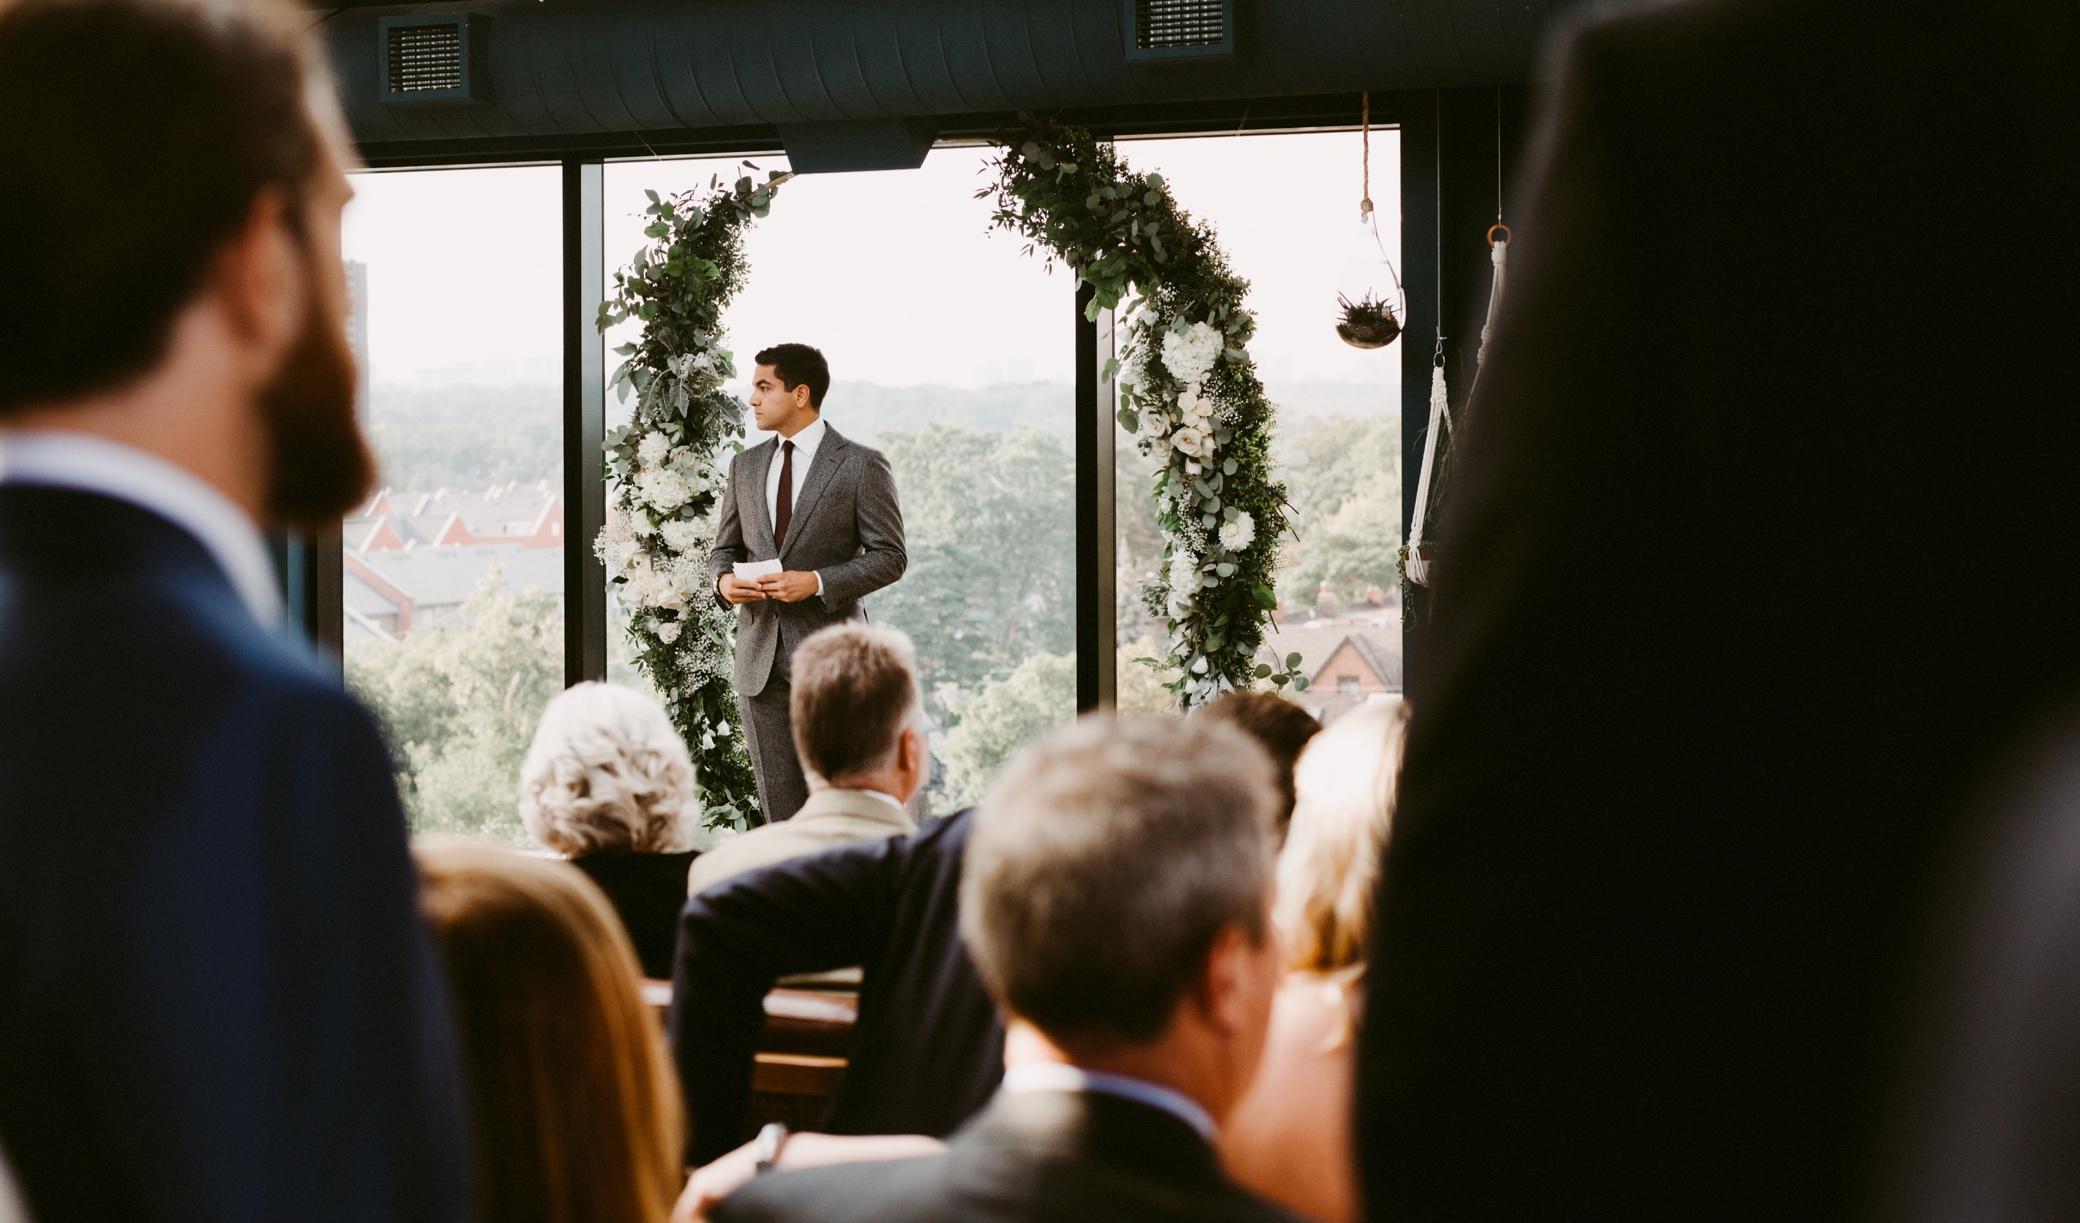 056_The Broadview Hotel Wedding (386 of 913).jpg